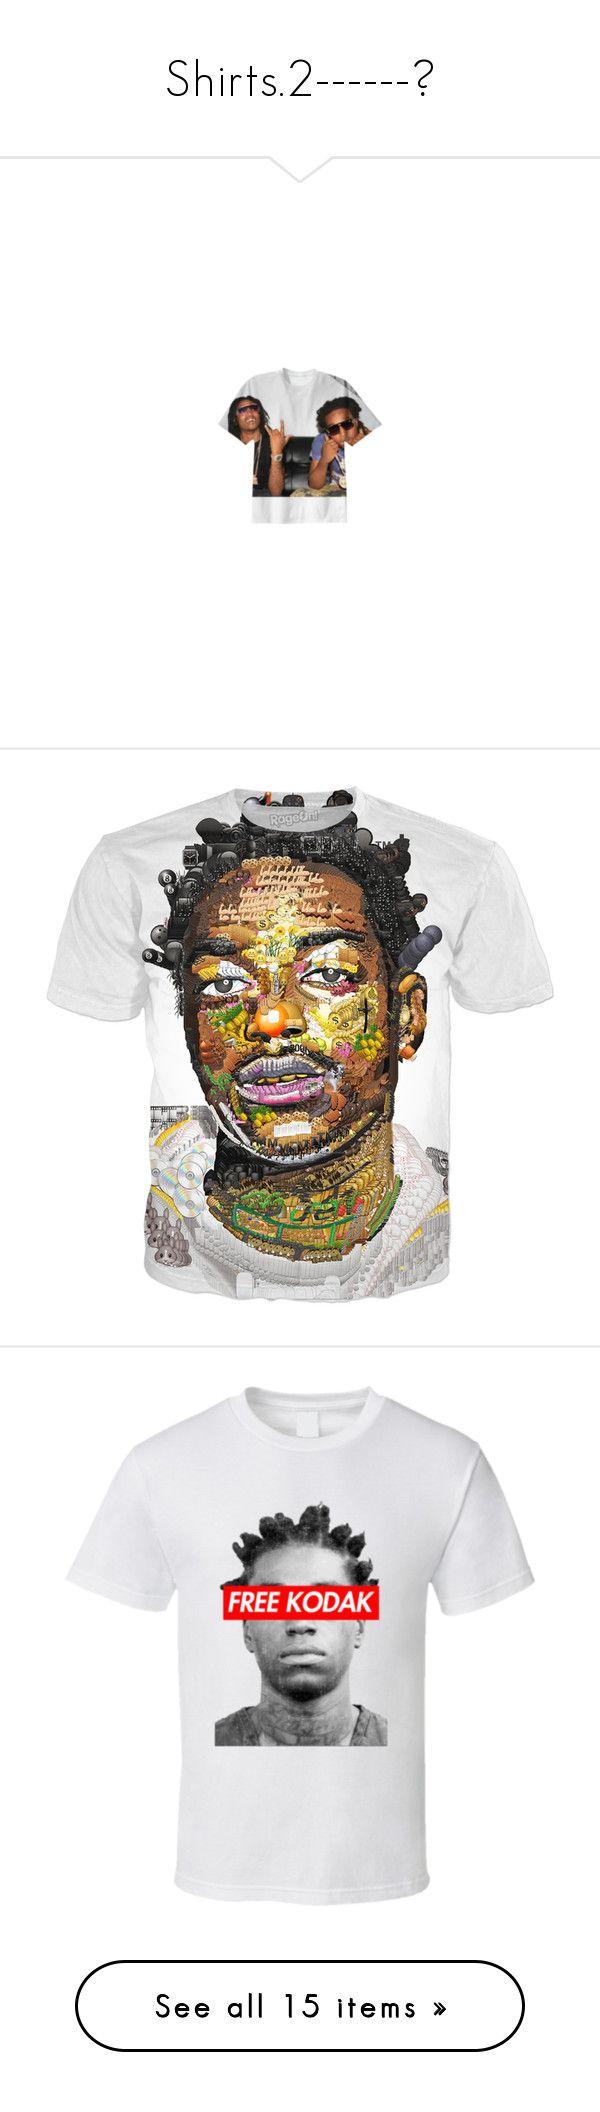 """Shirts.2------♡"" by goldnkurls ❤ liked on Polyvore featuring tops, t-shirts, faded t shirts, cotton t shirts, flat top, kodak, graphic t shirts, shirts, crew t shirts and t shirt"